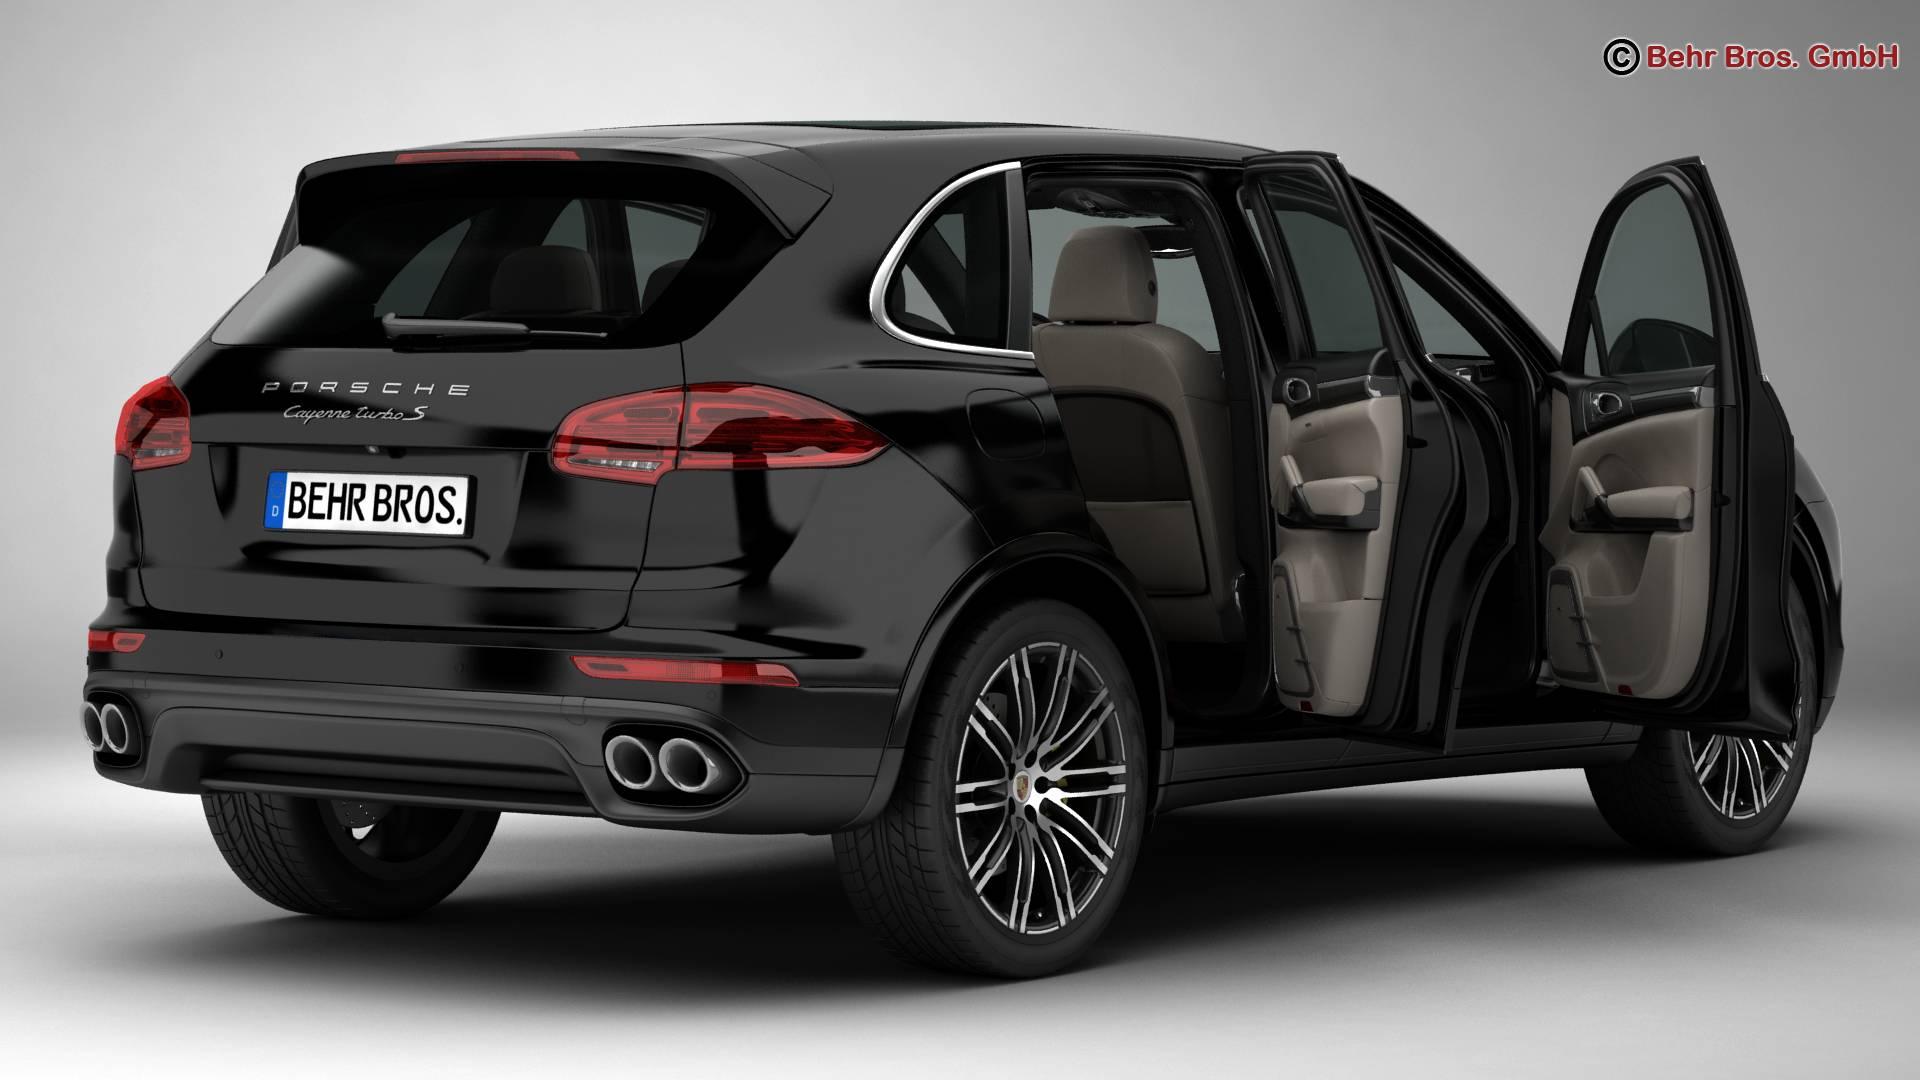 porsche cayenne turbo s 2016 3d model 3ds max fbx c4d lwo ma mb obj 214930